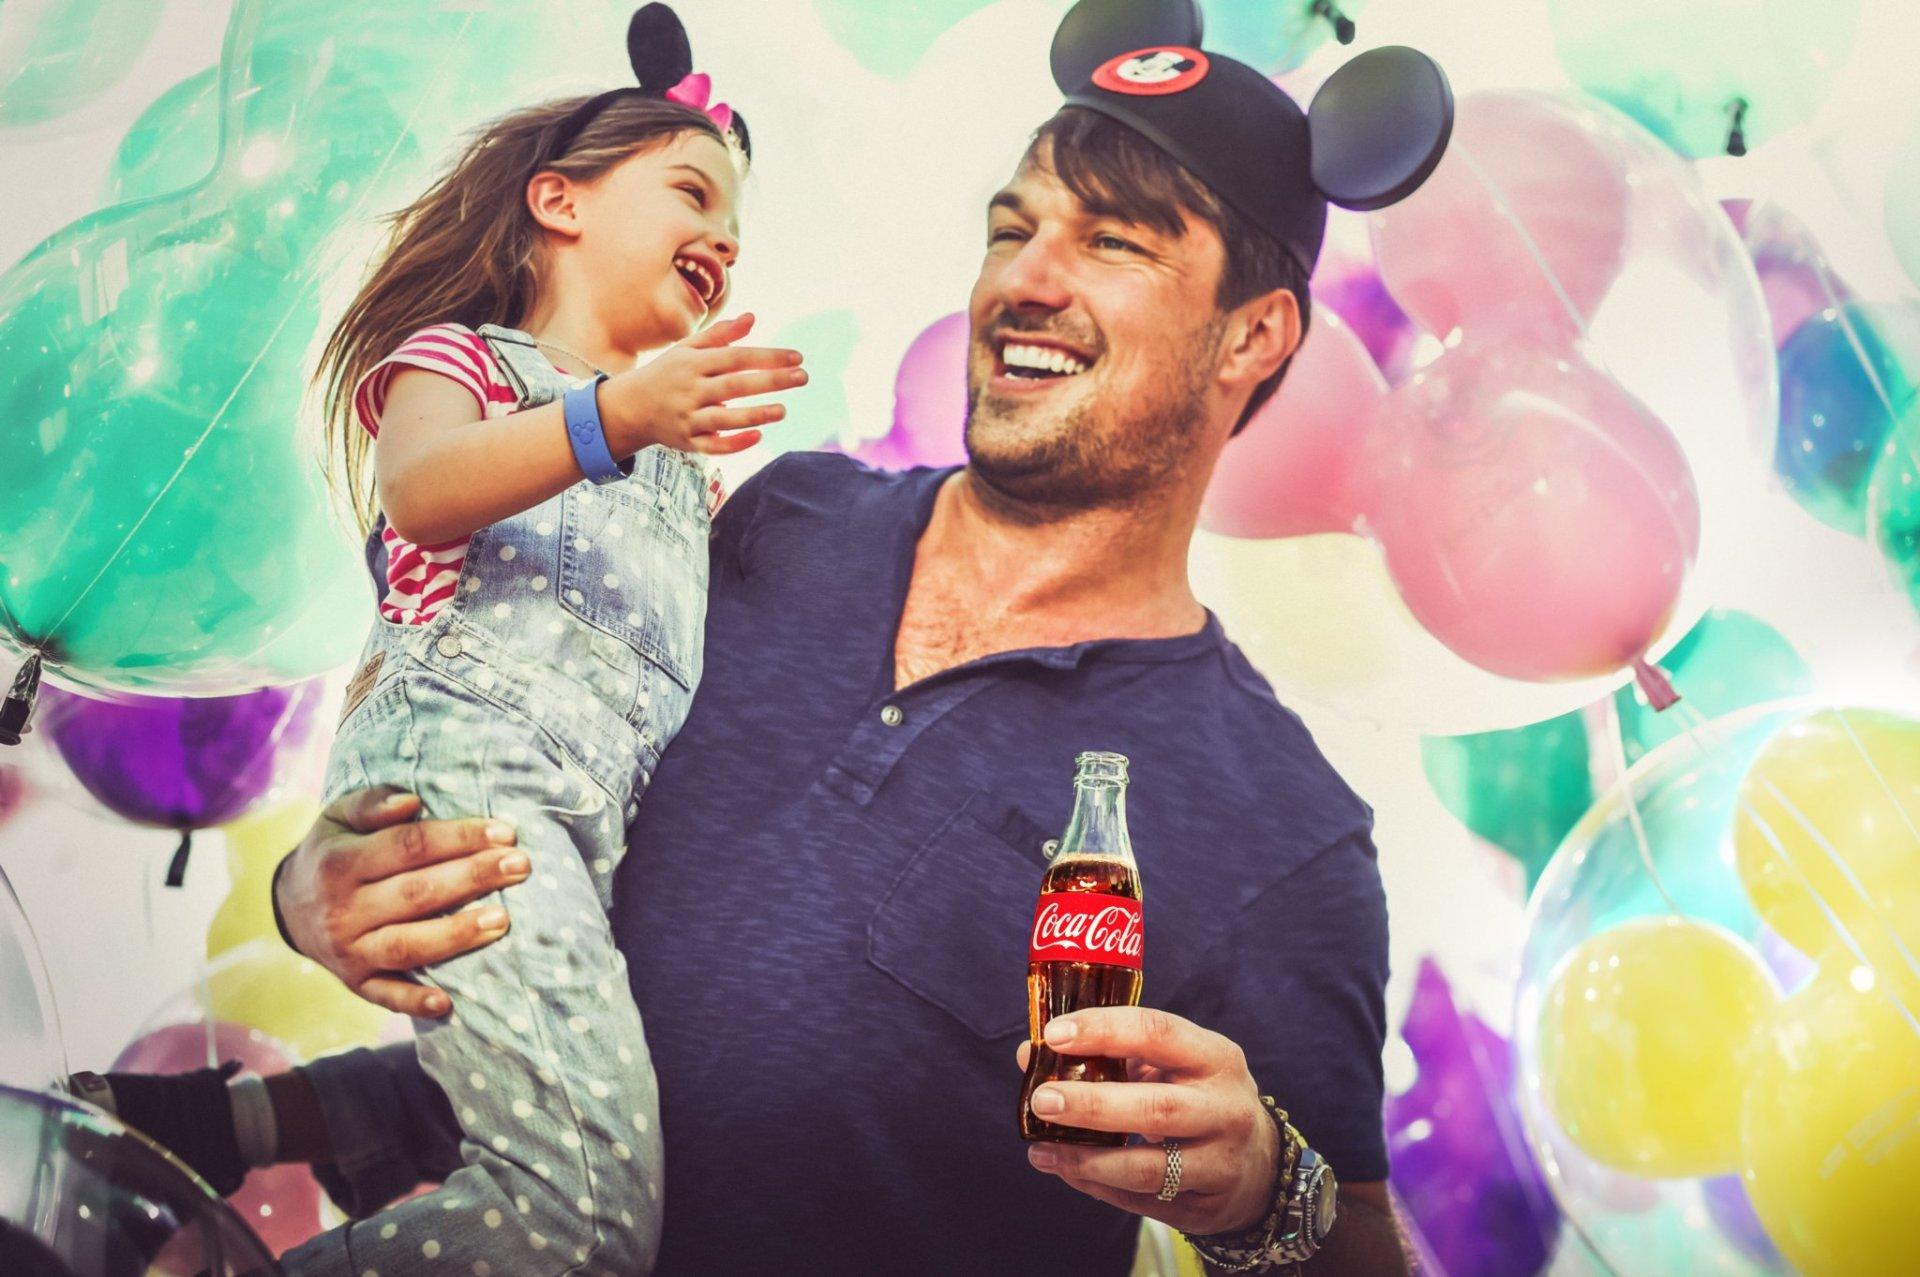 'Have a Coke Day' Celebrates at Disney Parks